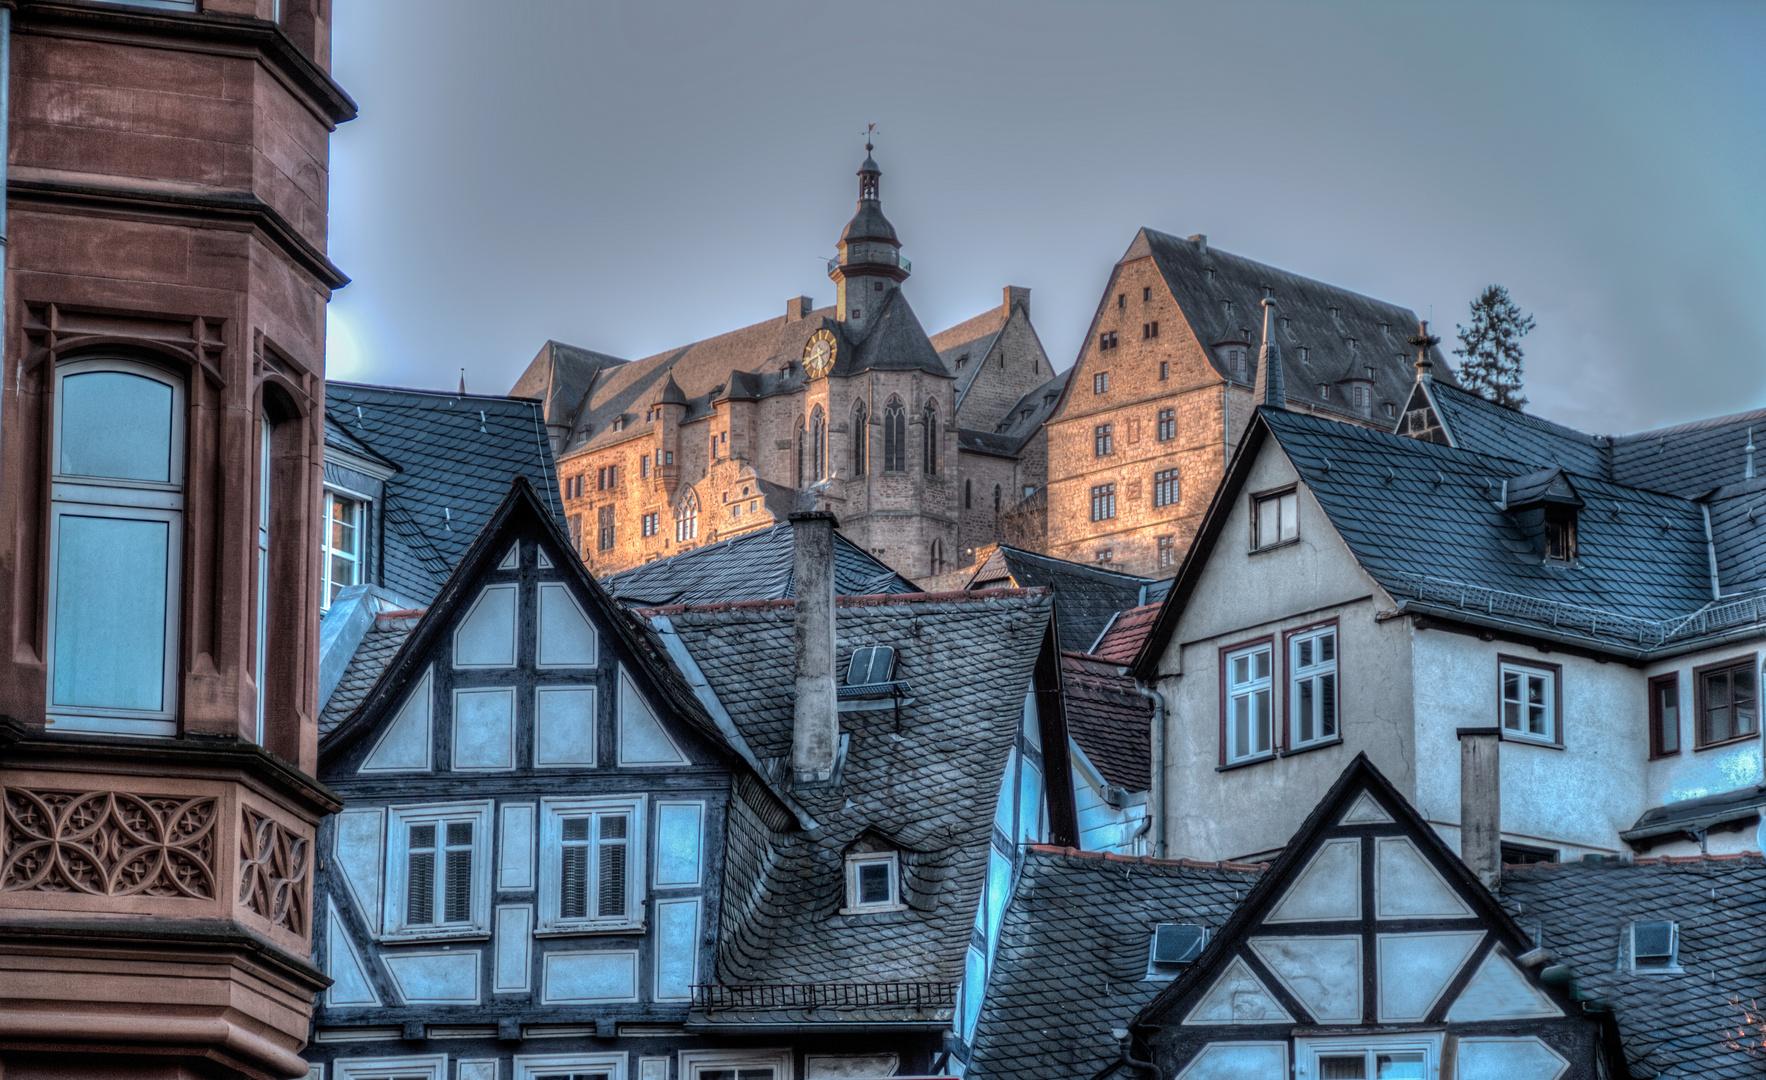 Landgrafenschloss in Marburg